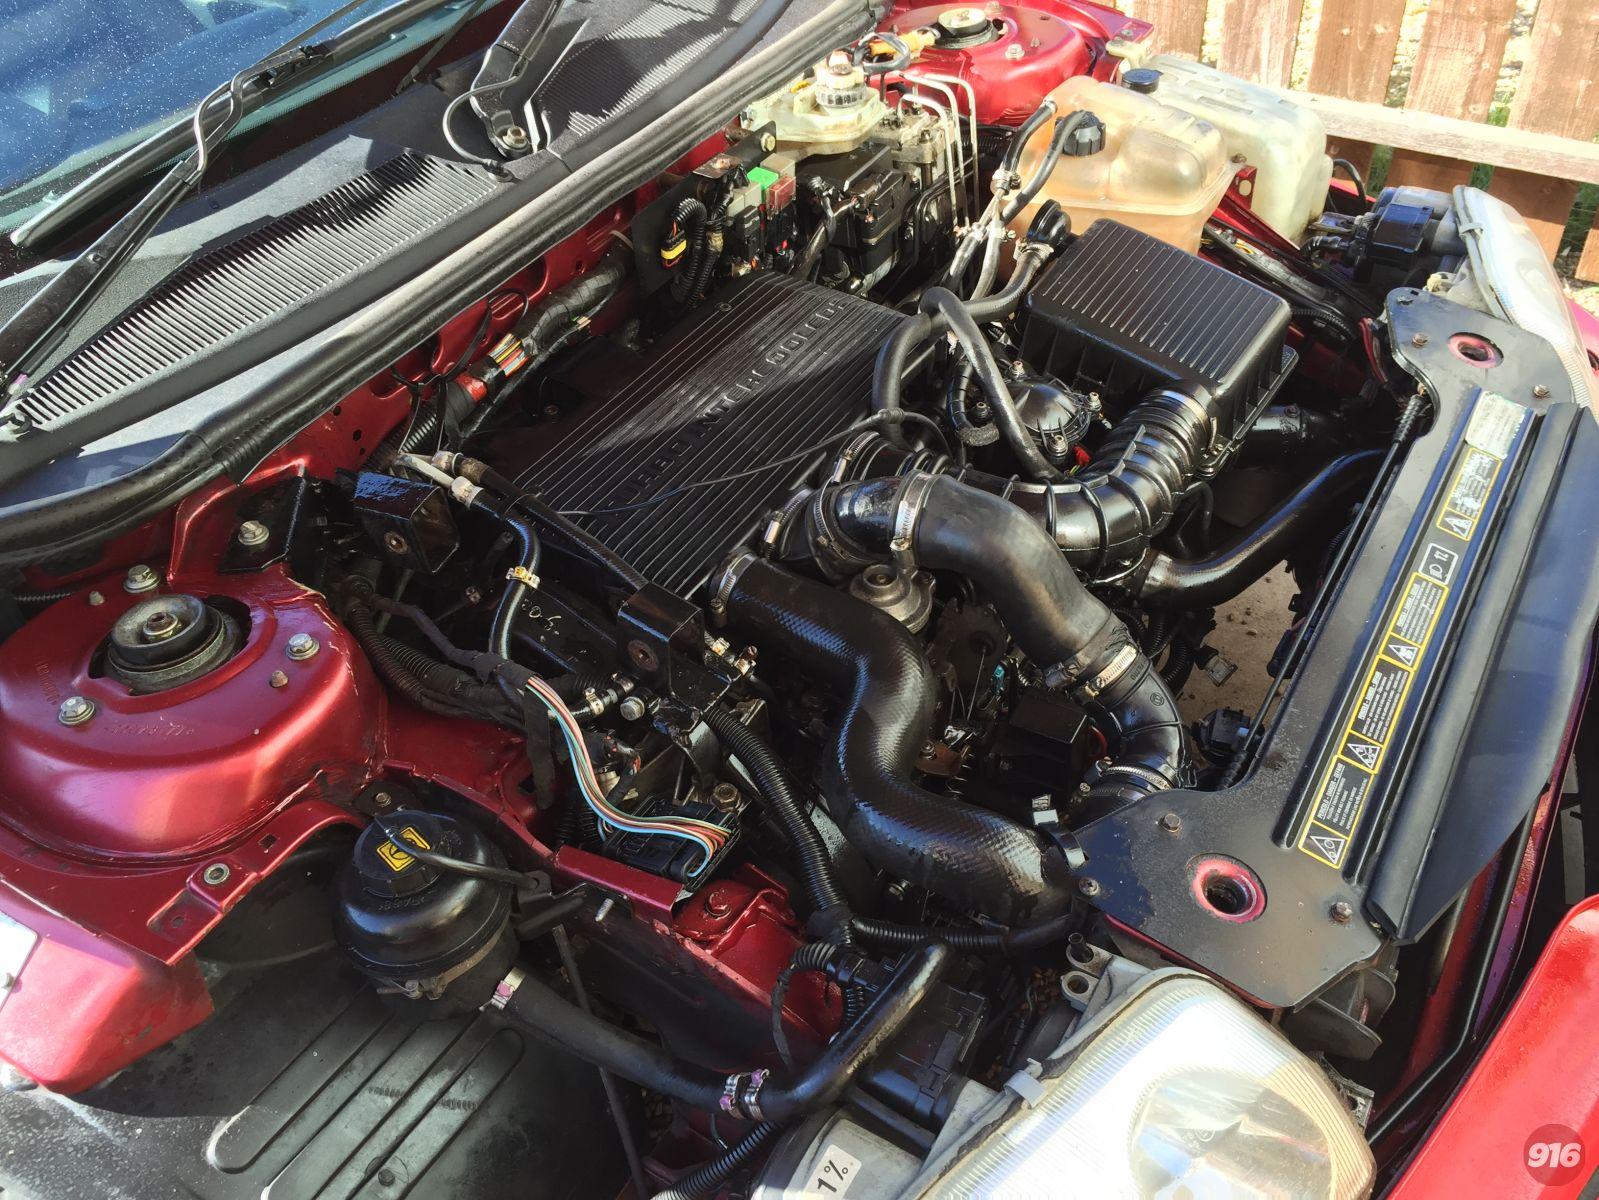 Peugeot 306 Turbo Diesel engine